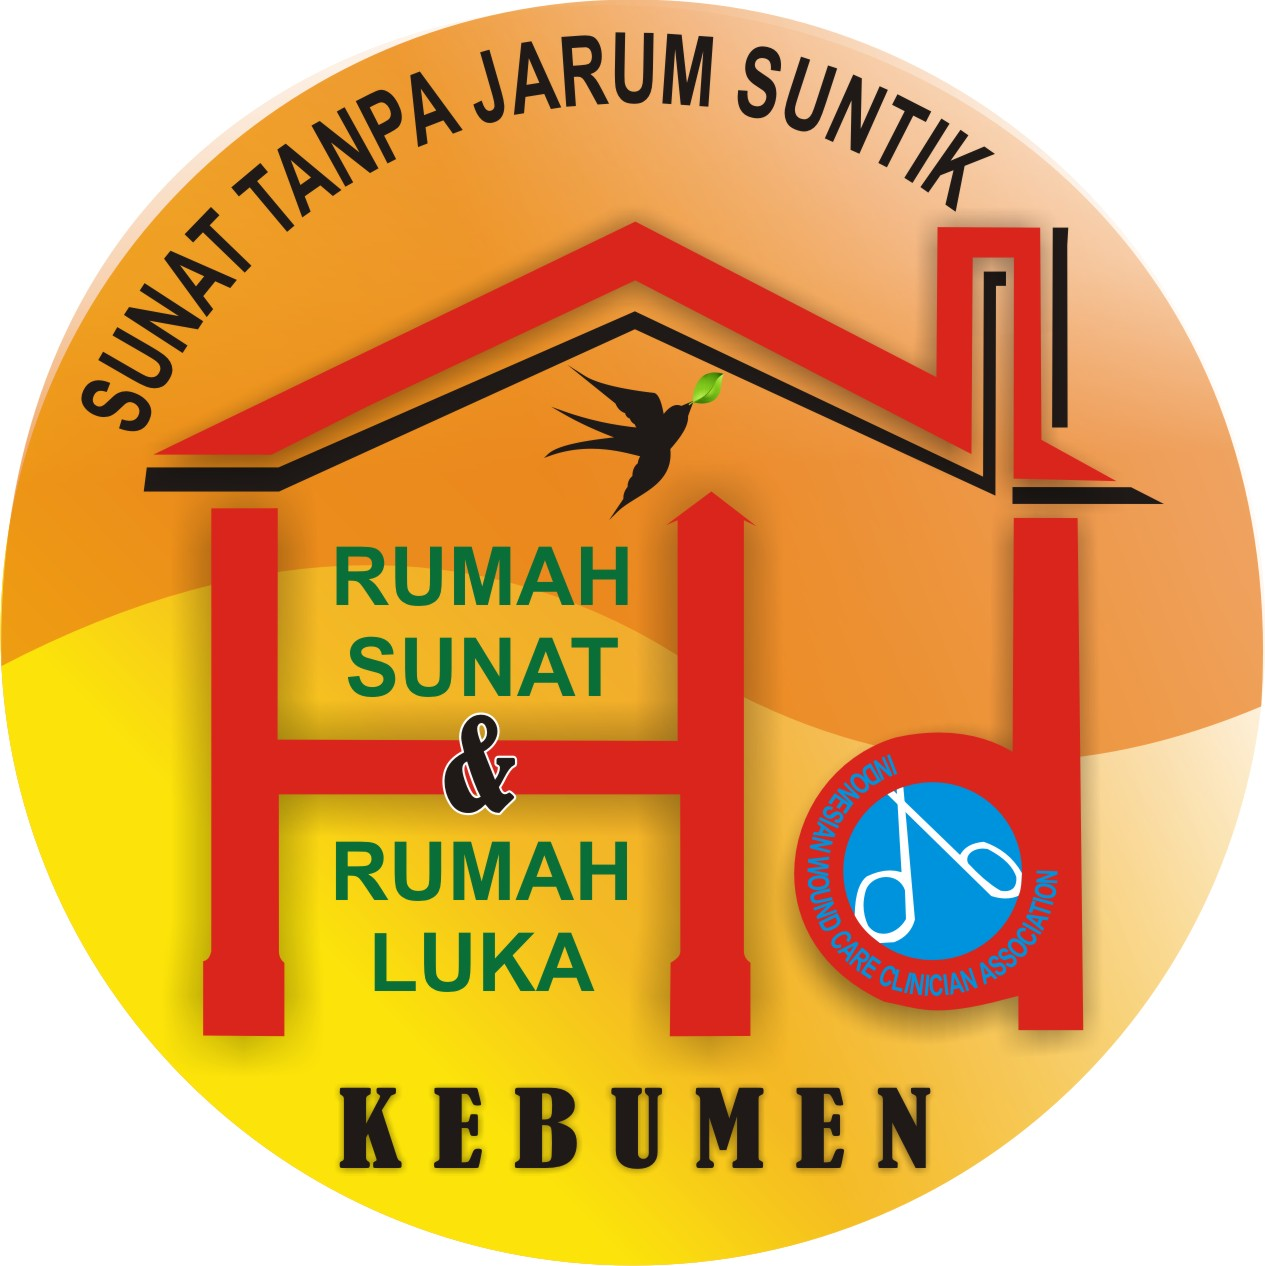 rumah sunatan rumah rawat luka modern 2012 kebumen jawa tengah indonesia